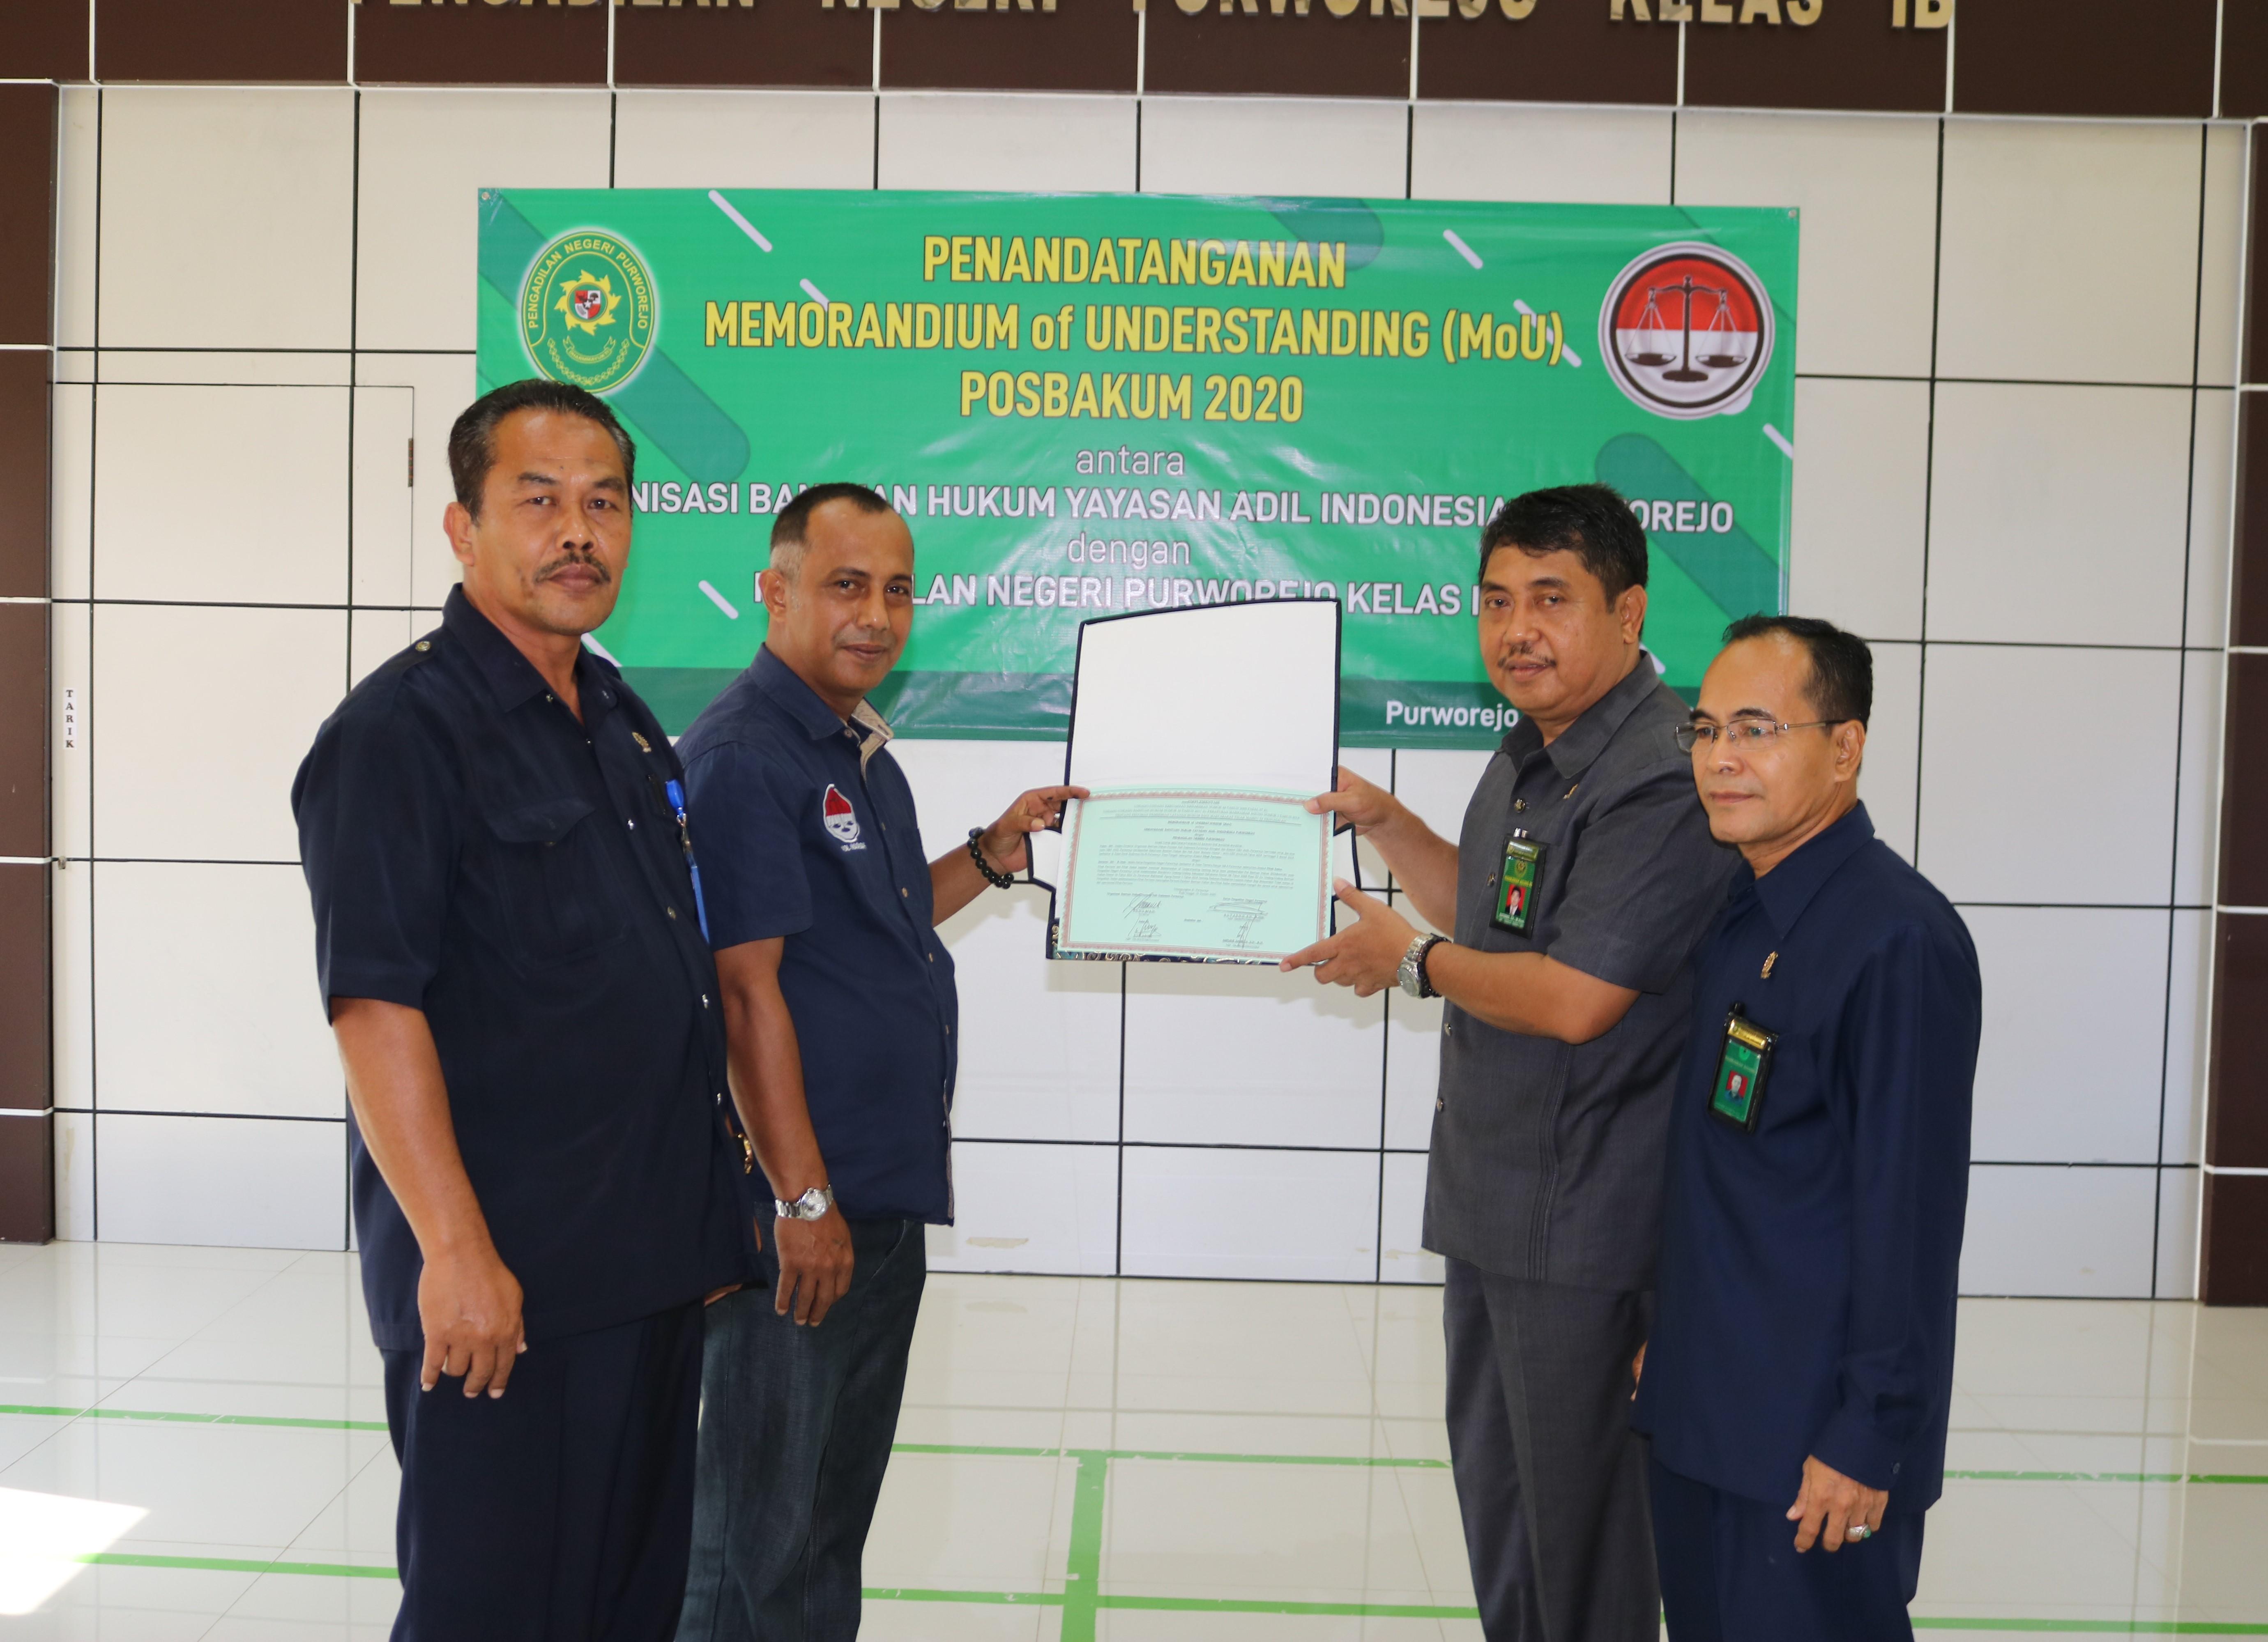 Penandatangan Memorandium of Understanding (MoU) Posbakum 2020 Pengadilan Negeri Purworejo Kelas I B